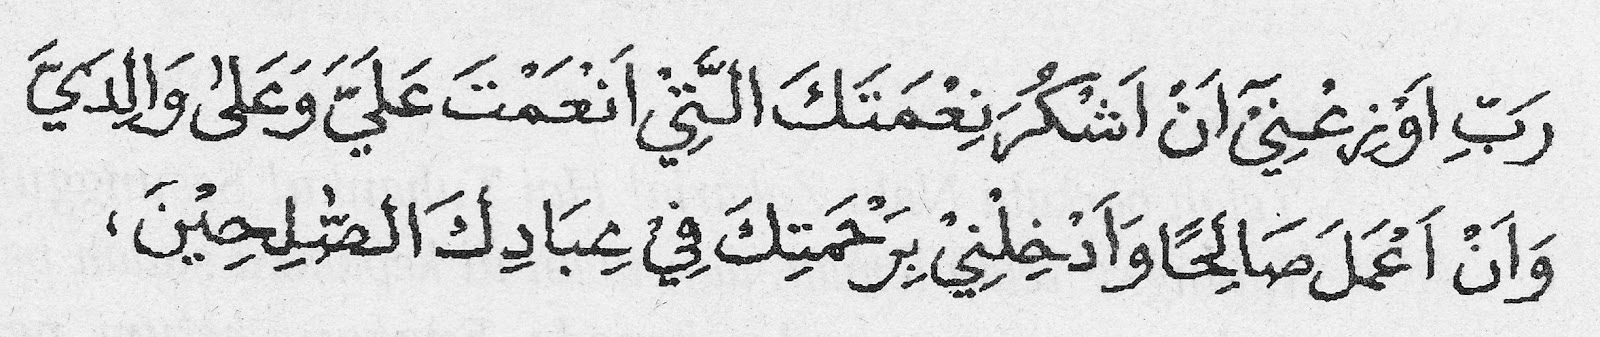 Doa, Doa nabi sulaiman, doa nabi - nabi